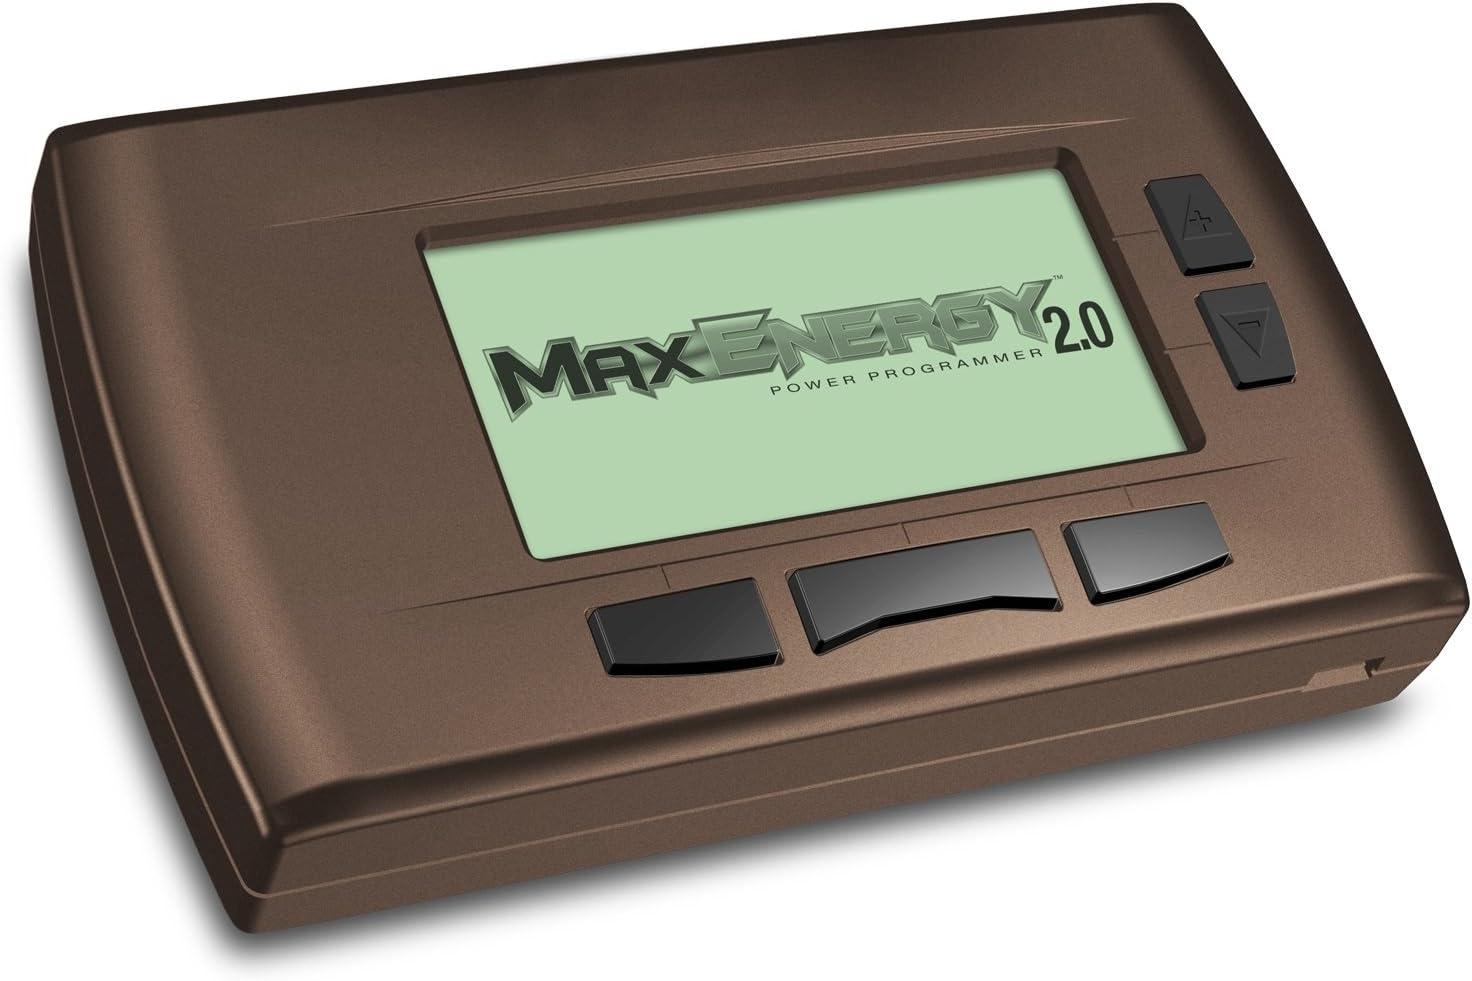 Hypertech 2300 Long-awaited Max Energy 2.0 Je Fresno Mall California 2007-2014 Jk Edition